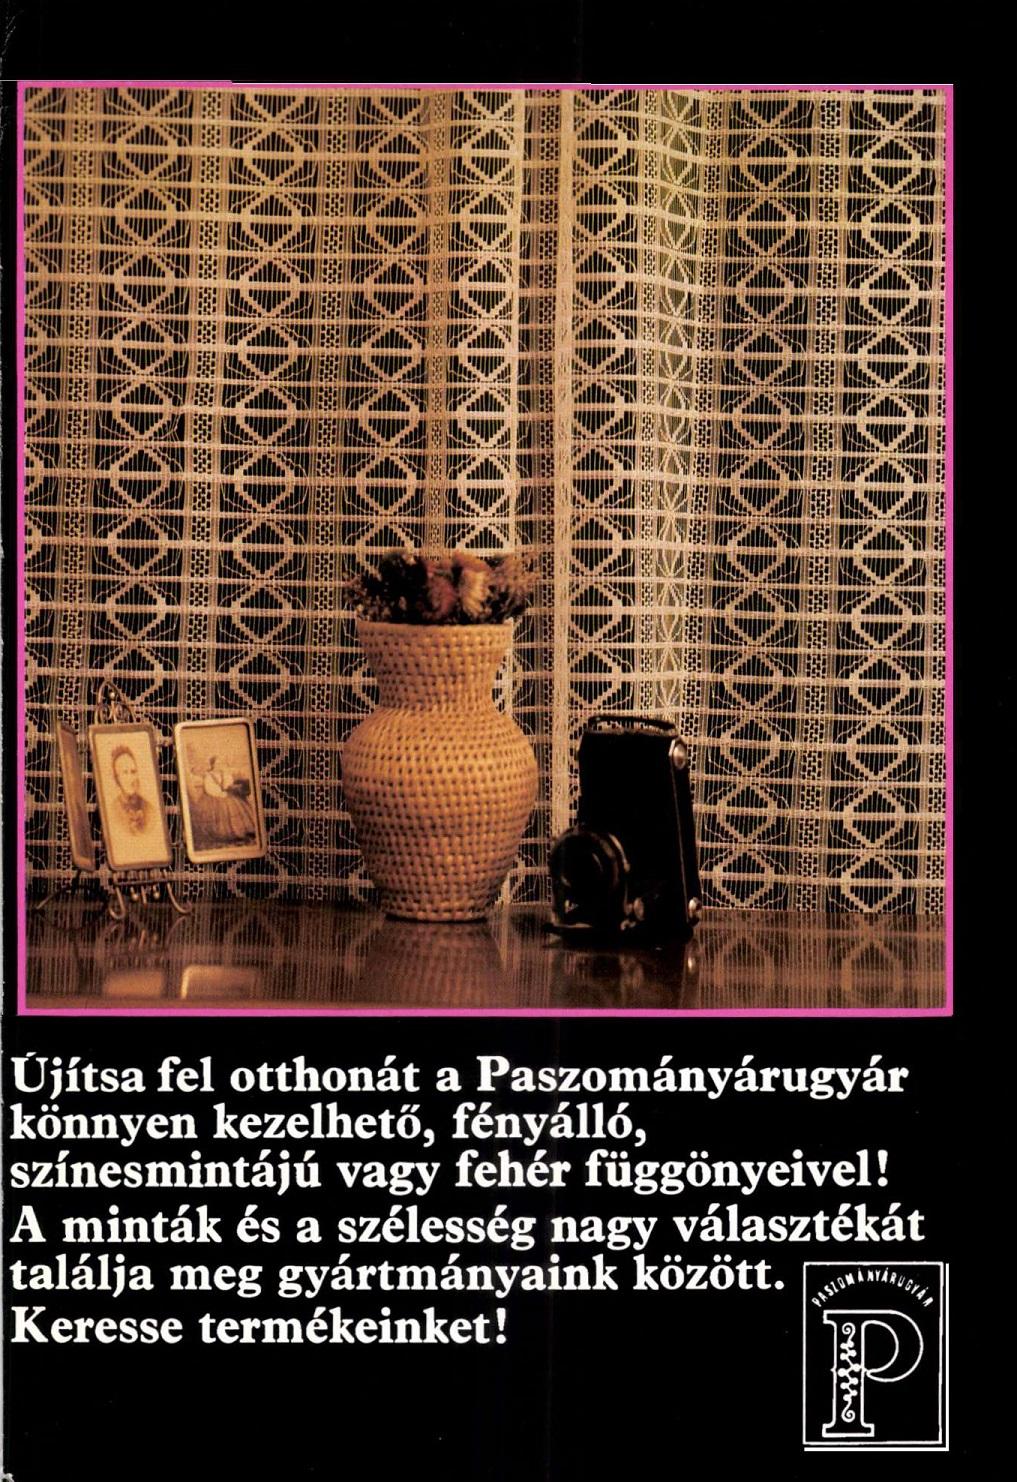 idokapszula_nb_i_1983_84_21_fordulo_reklam_2.jpg